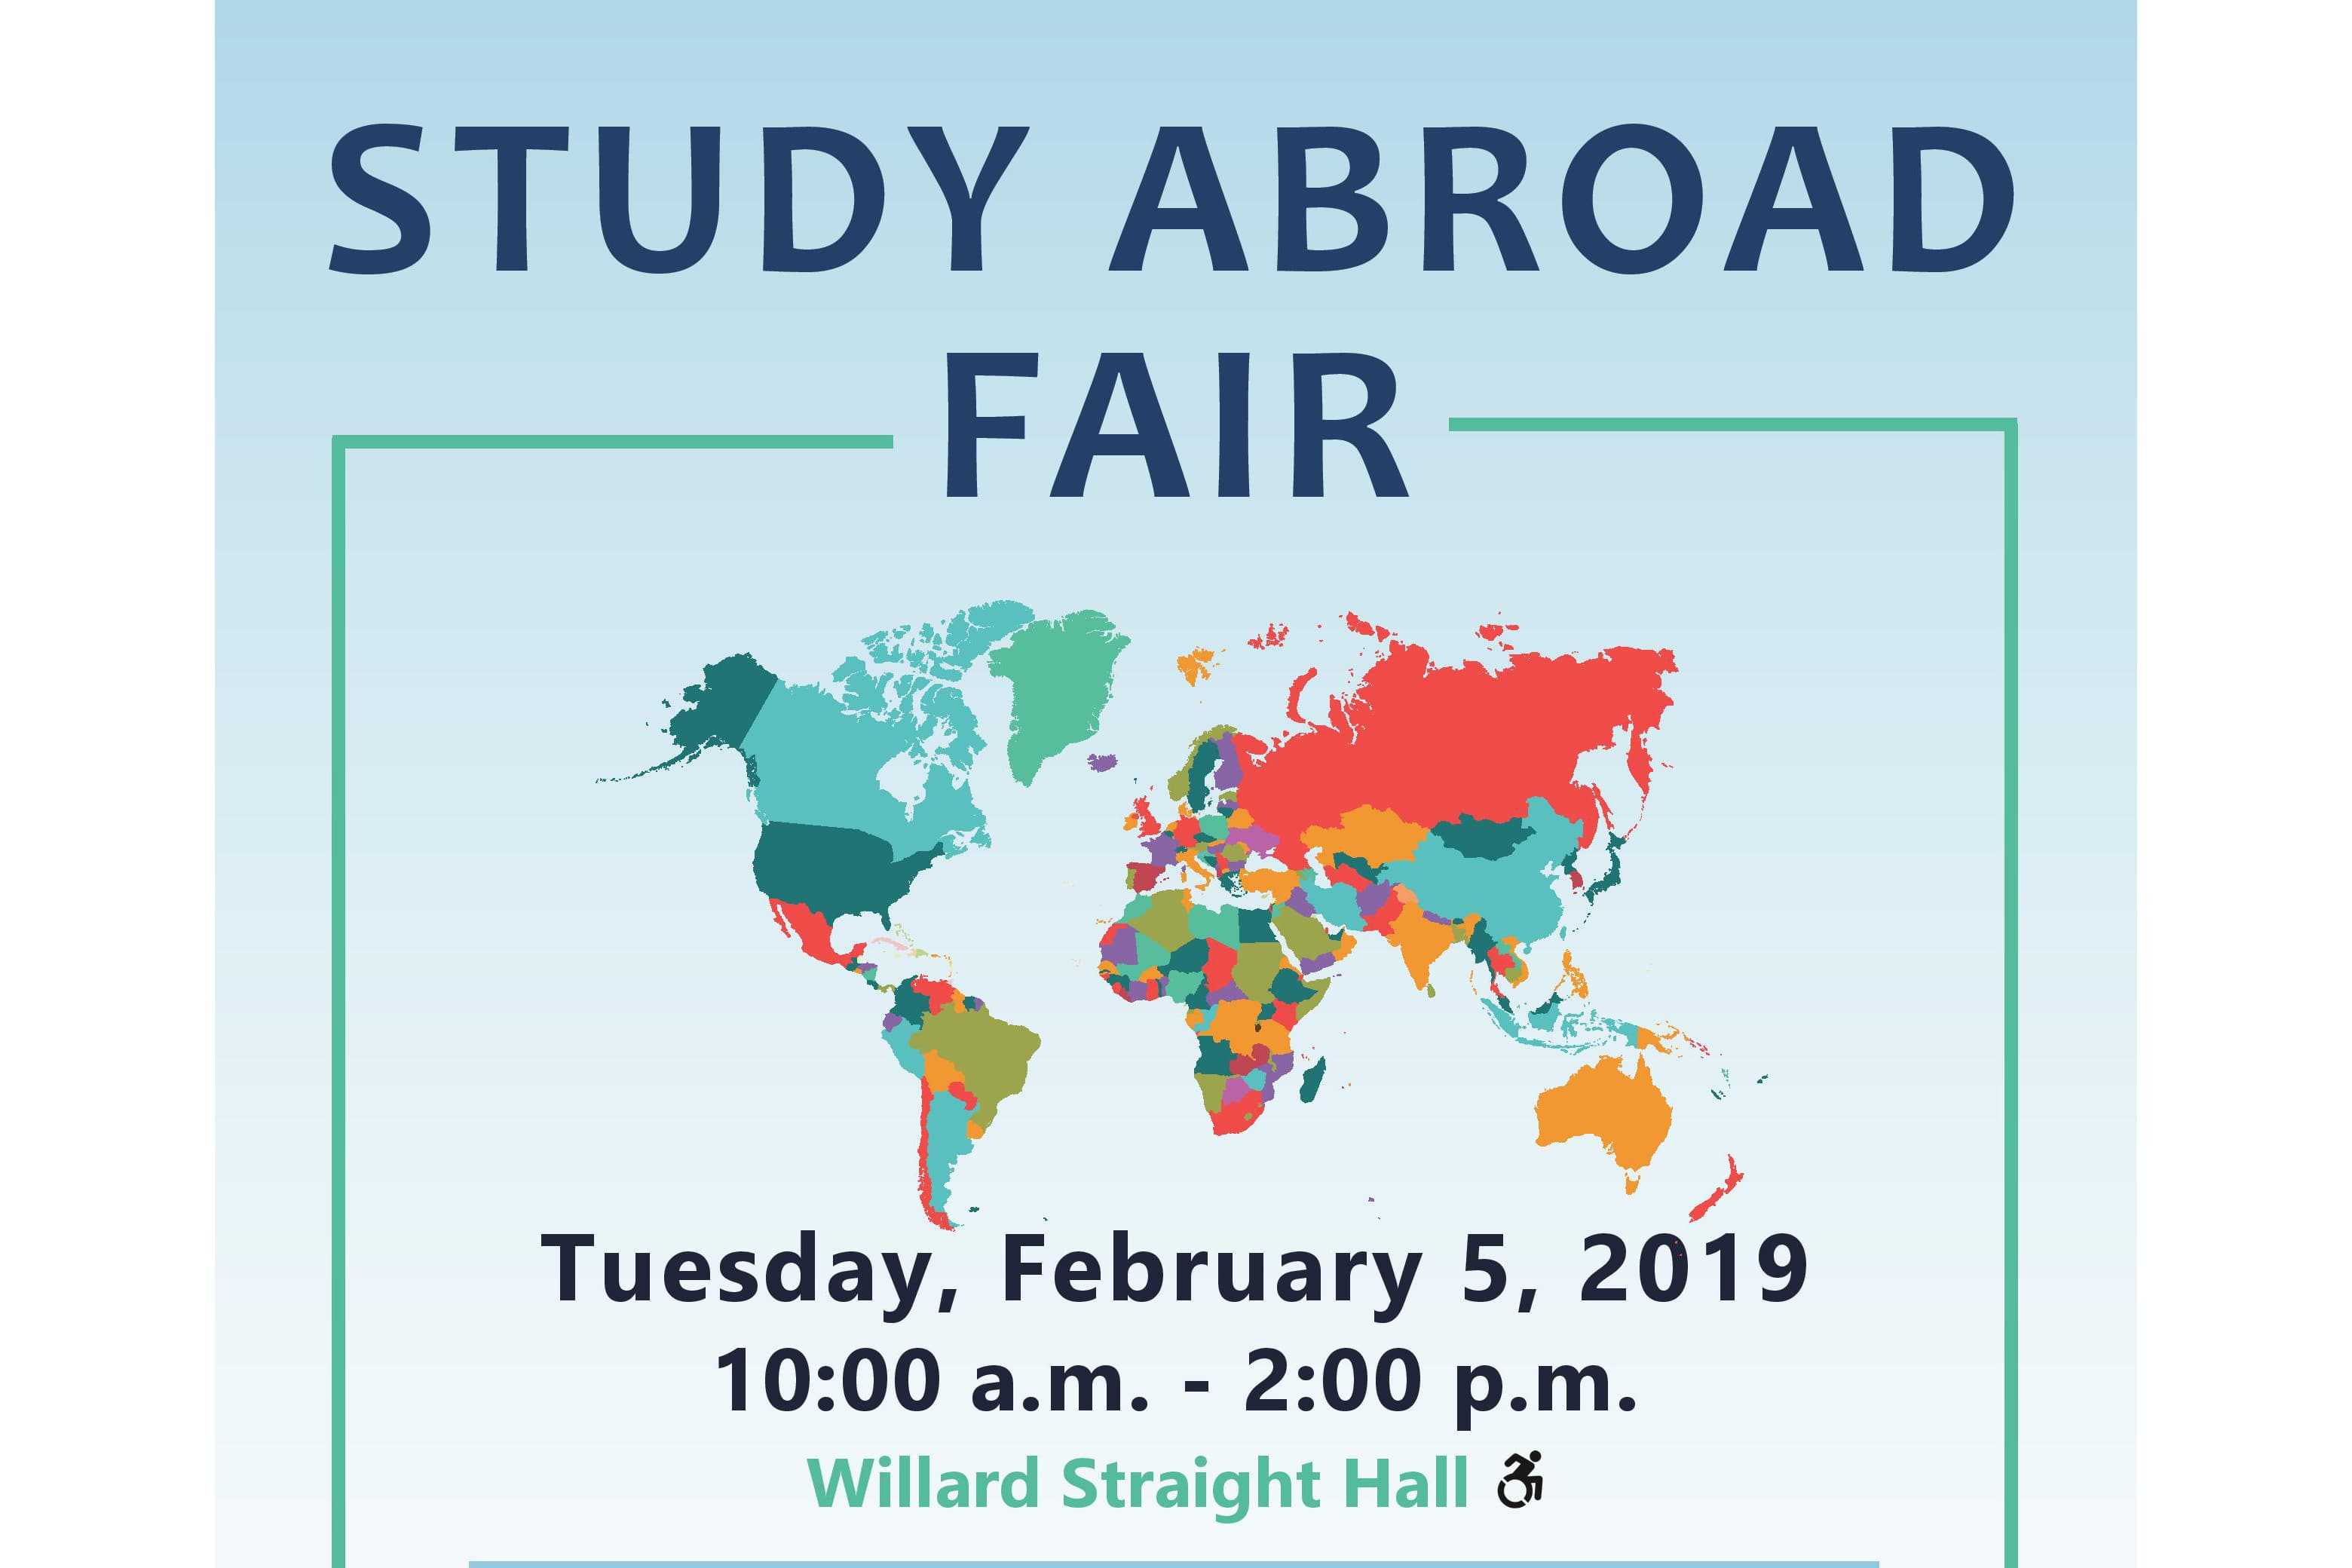 Study Abroad Fair, Tuesday, February 5, 2019